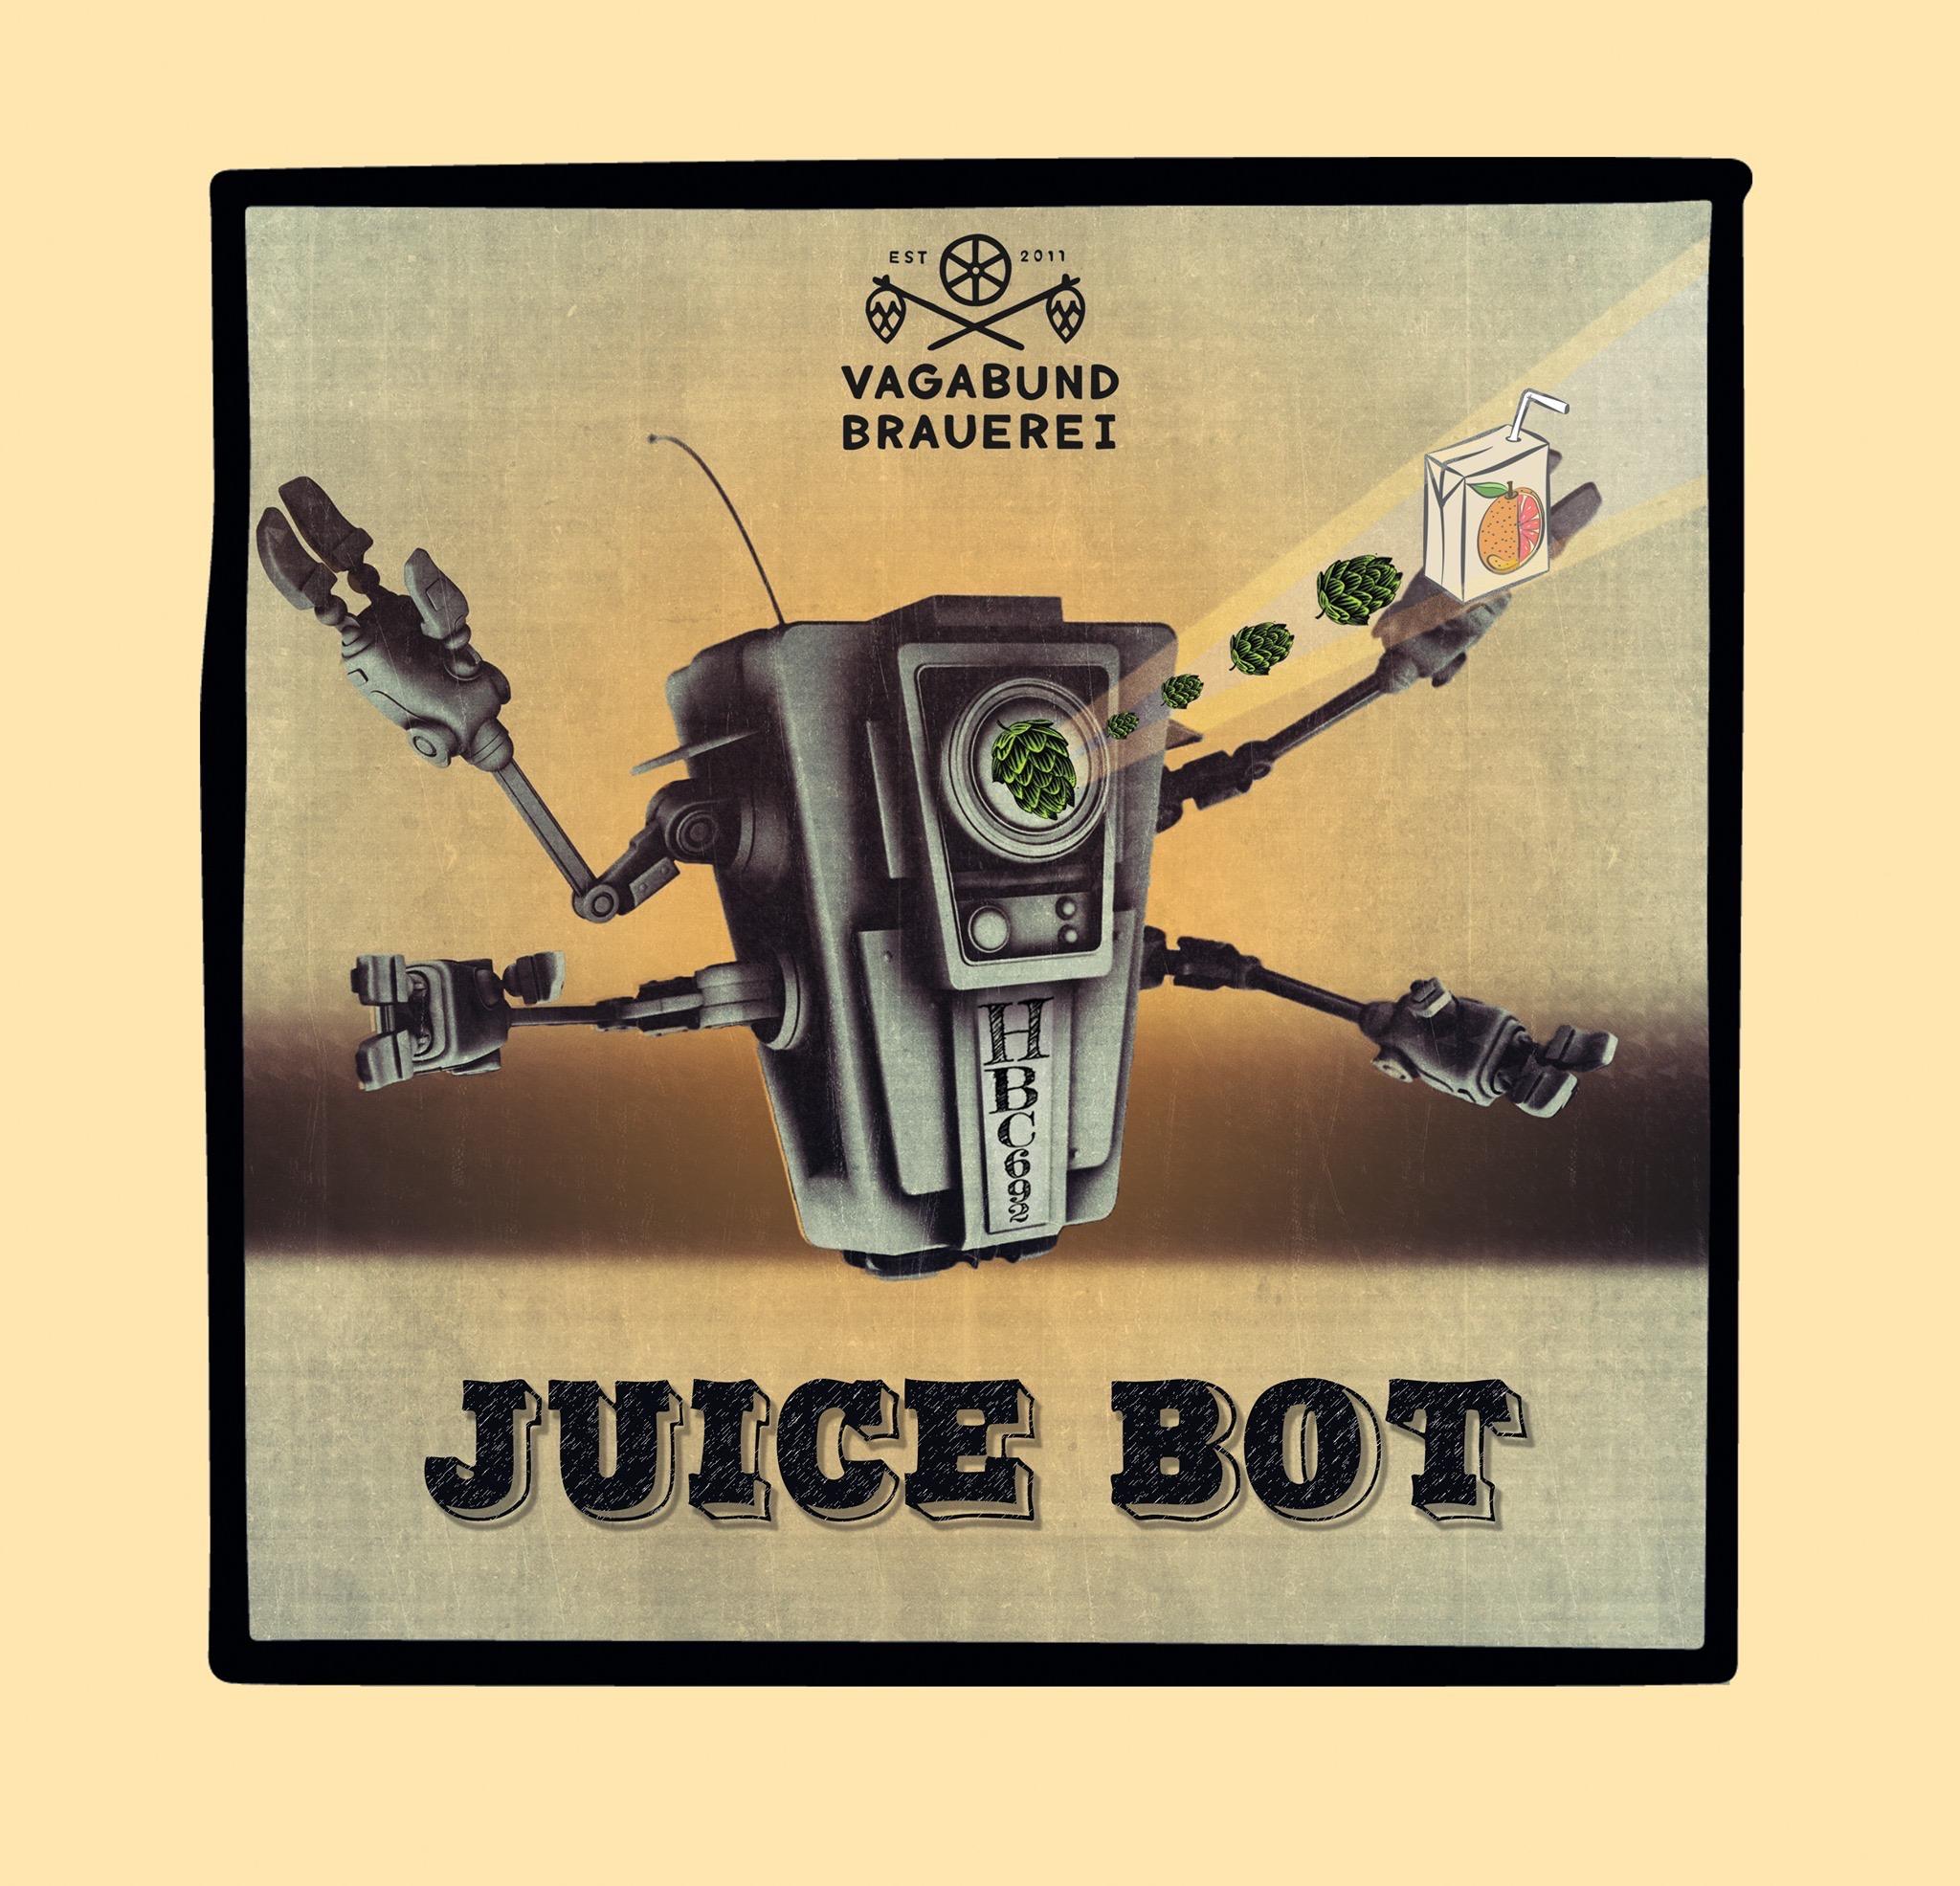 Juice Bot (Vagabund)